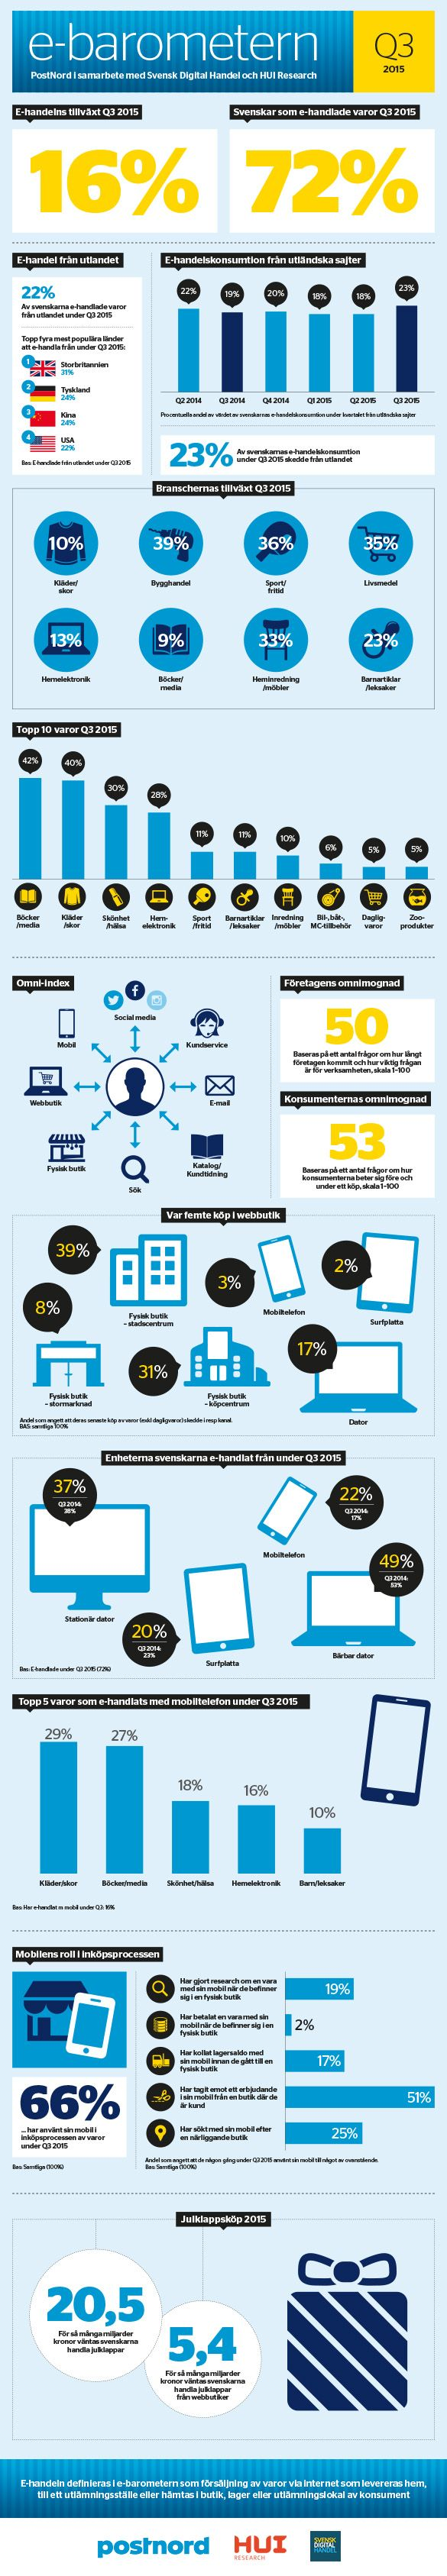 Infografik över e-barometern tredje kvartalet 2015